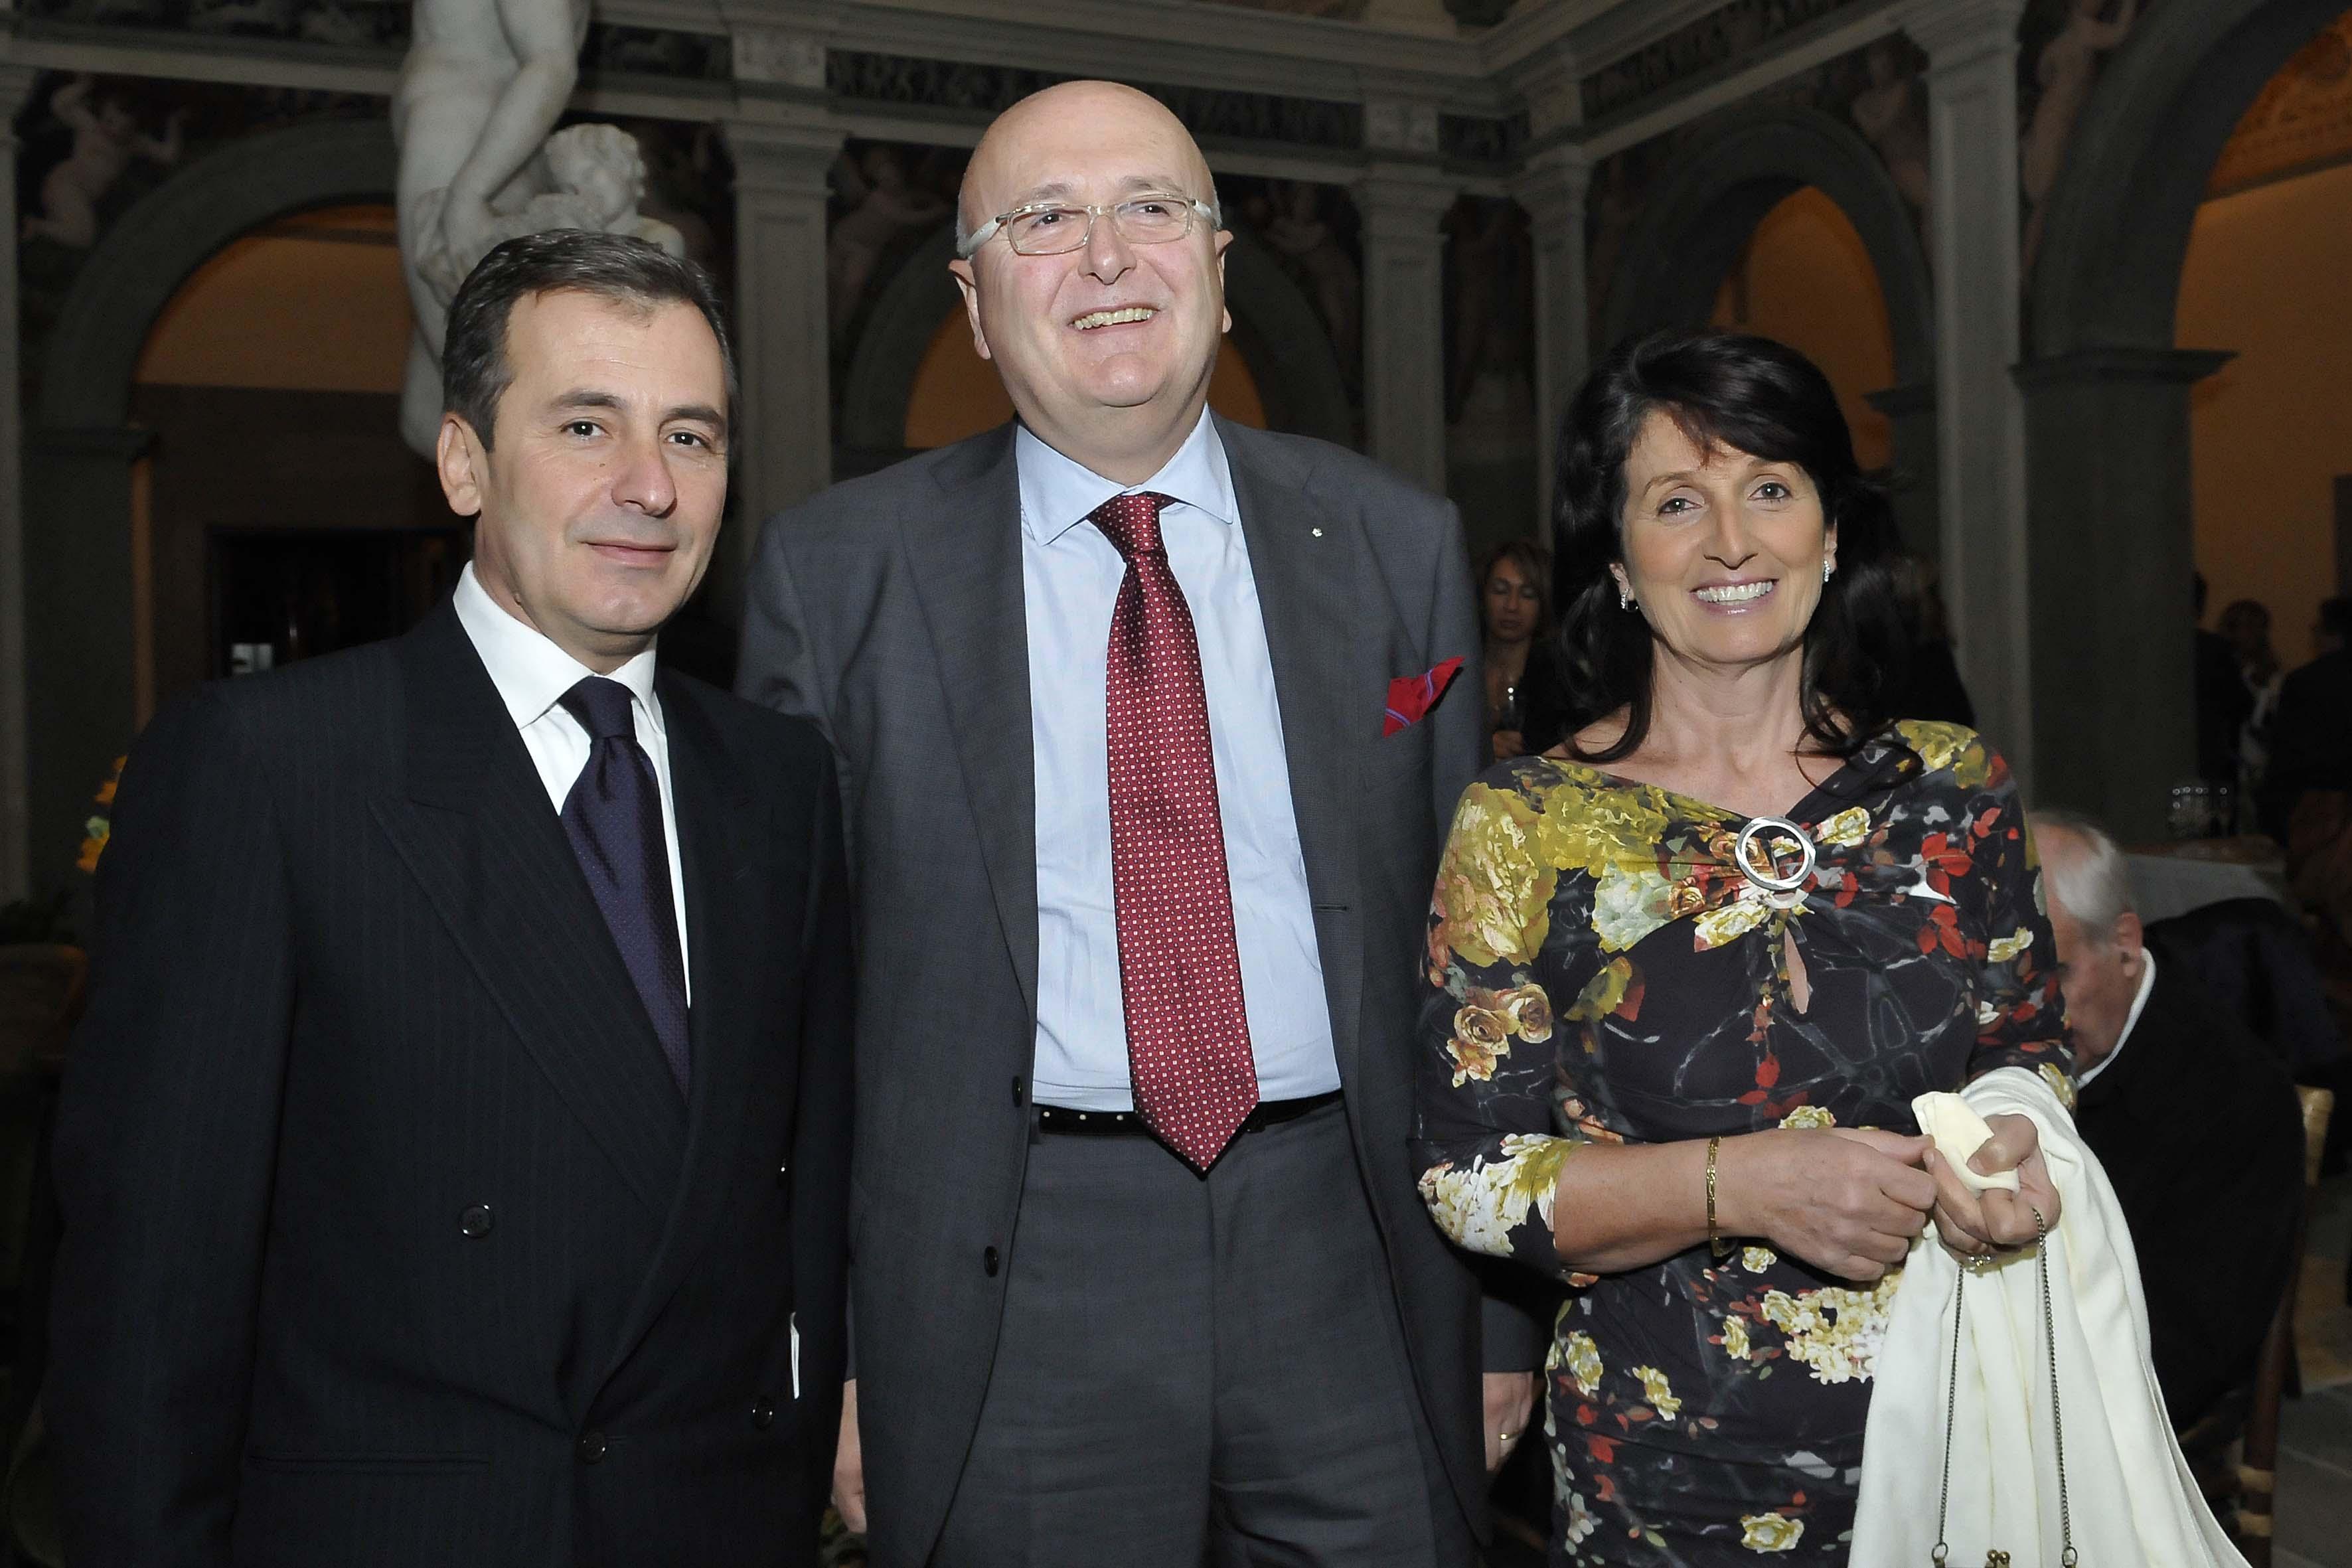 Pasquale Garina,Franco Vannini, Cristina Marinelli